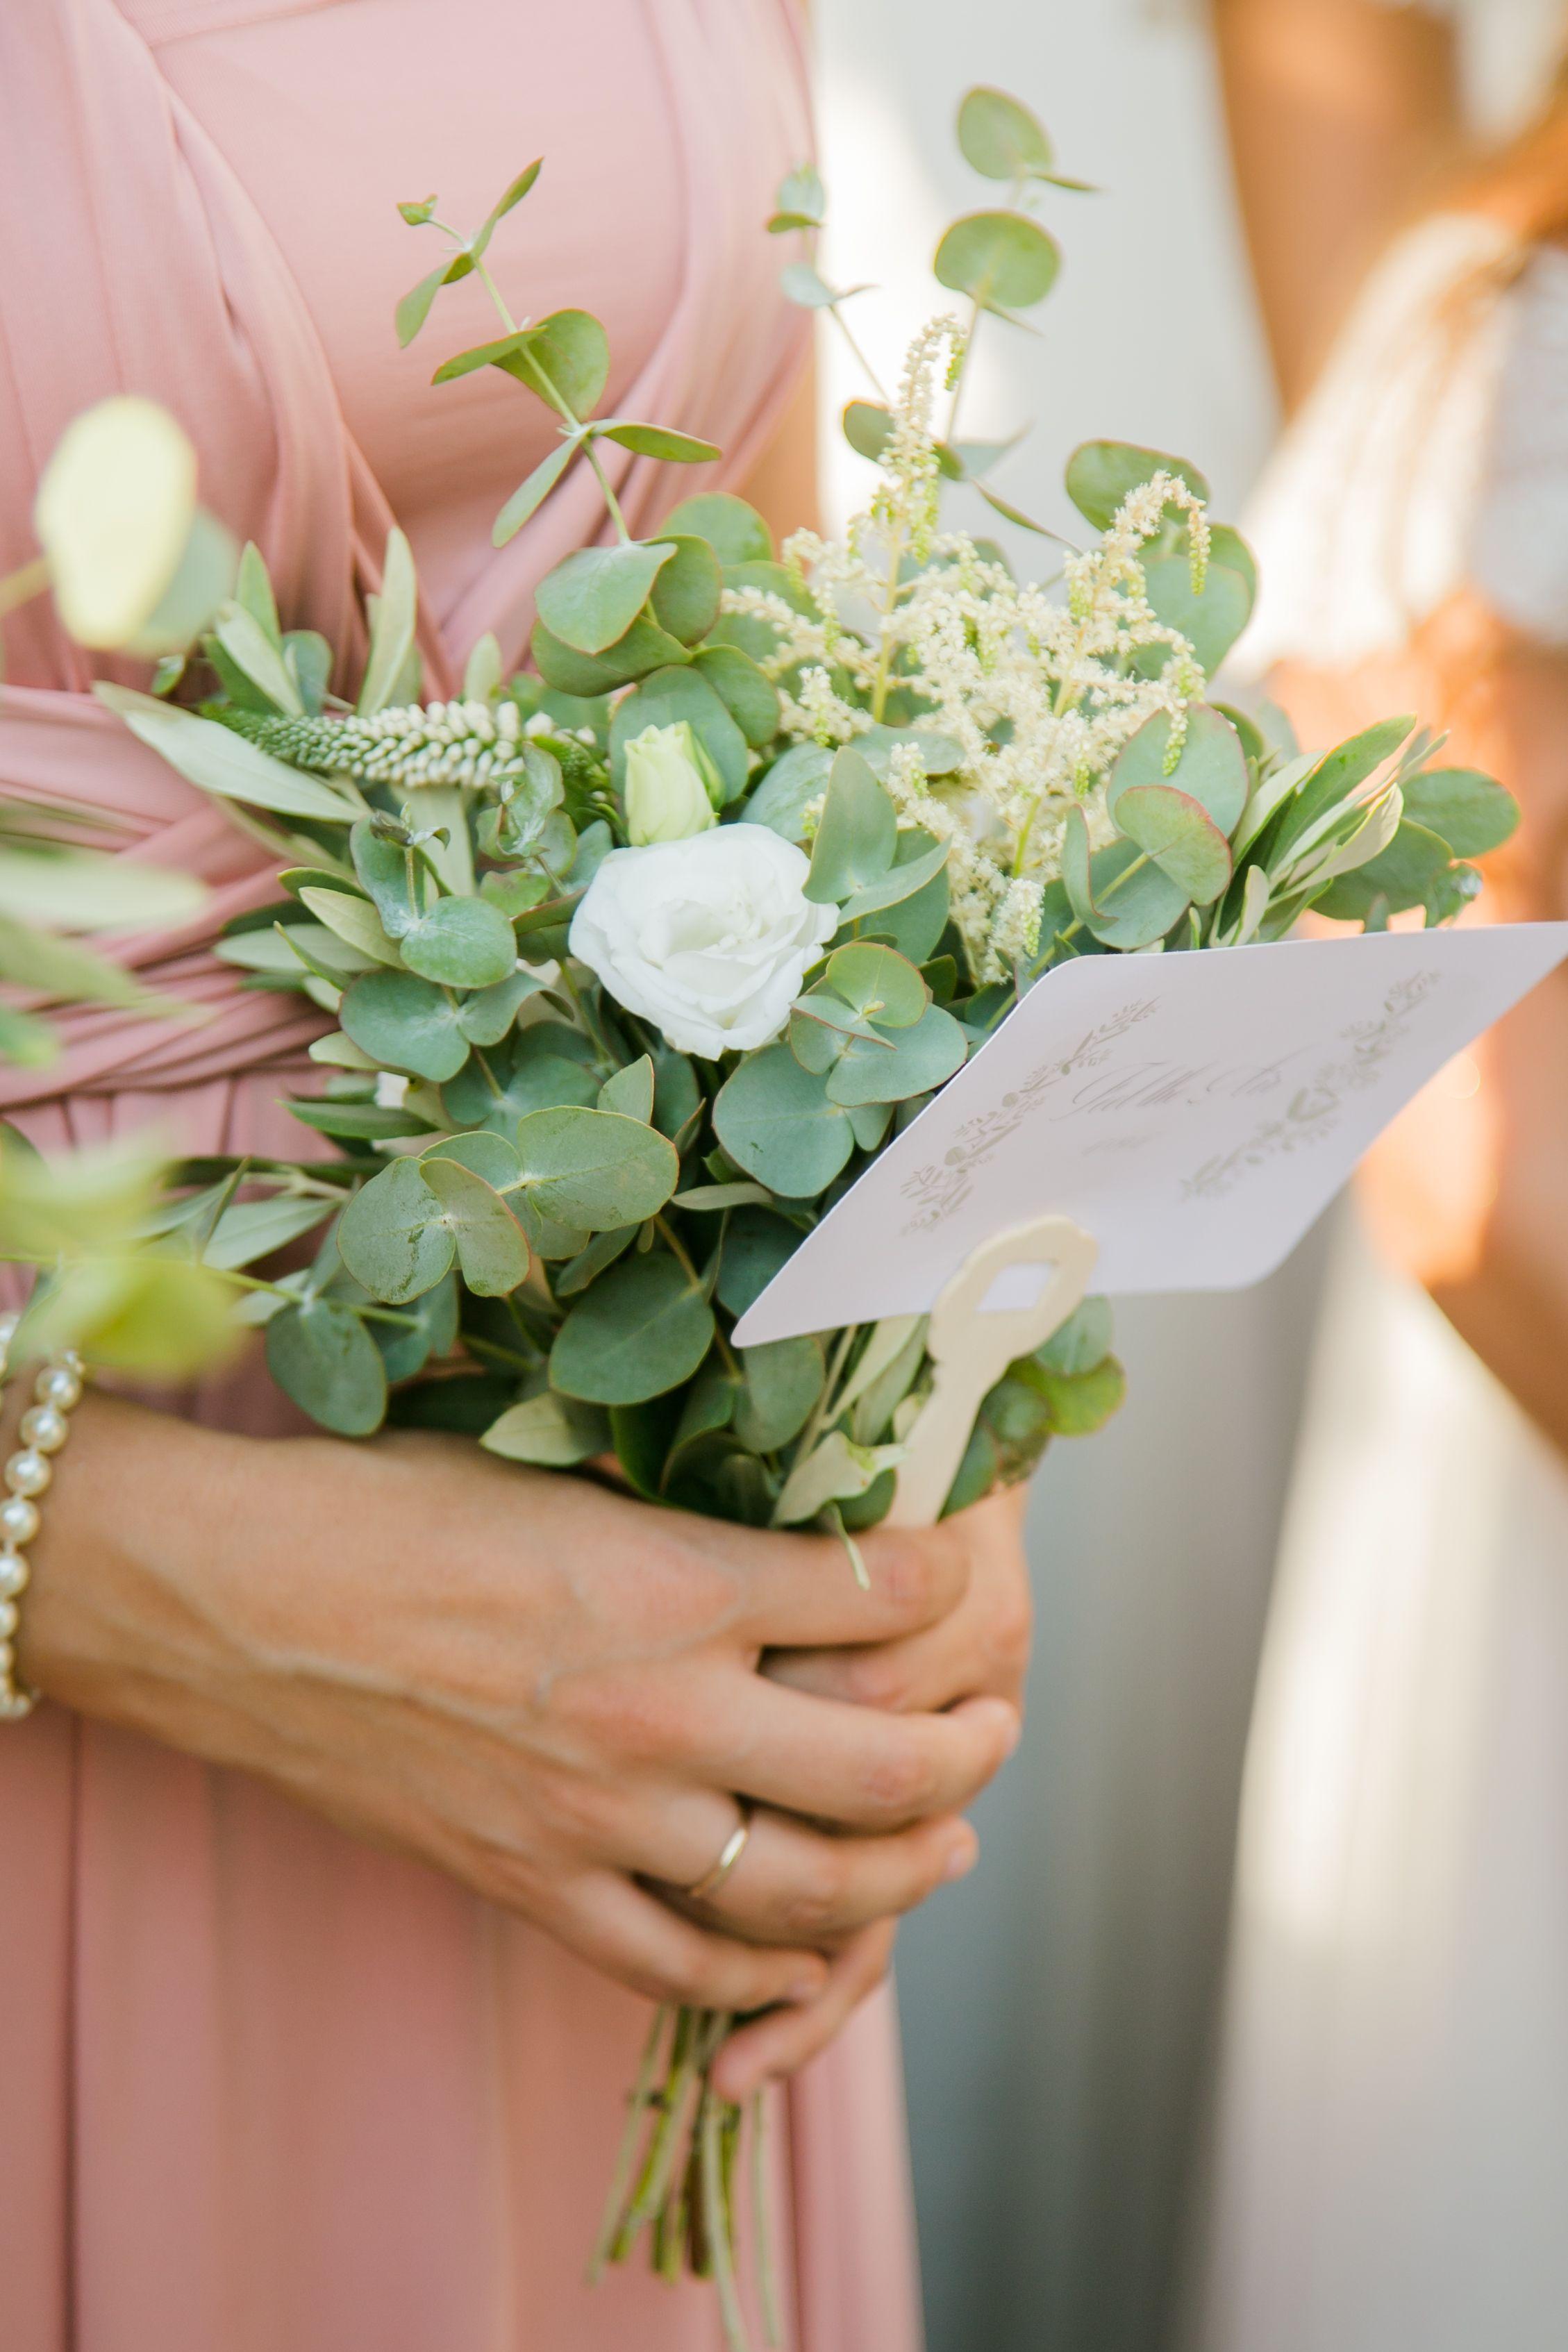 Bridesmaid bouquet flowers greek wedding hand fan summer wedding bridesmaid bouquet flowers greek wedding hand fan summer wedding eucalyptus izmirmasajfo